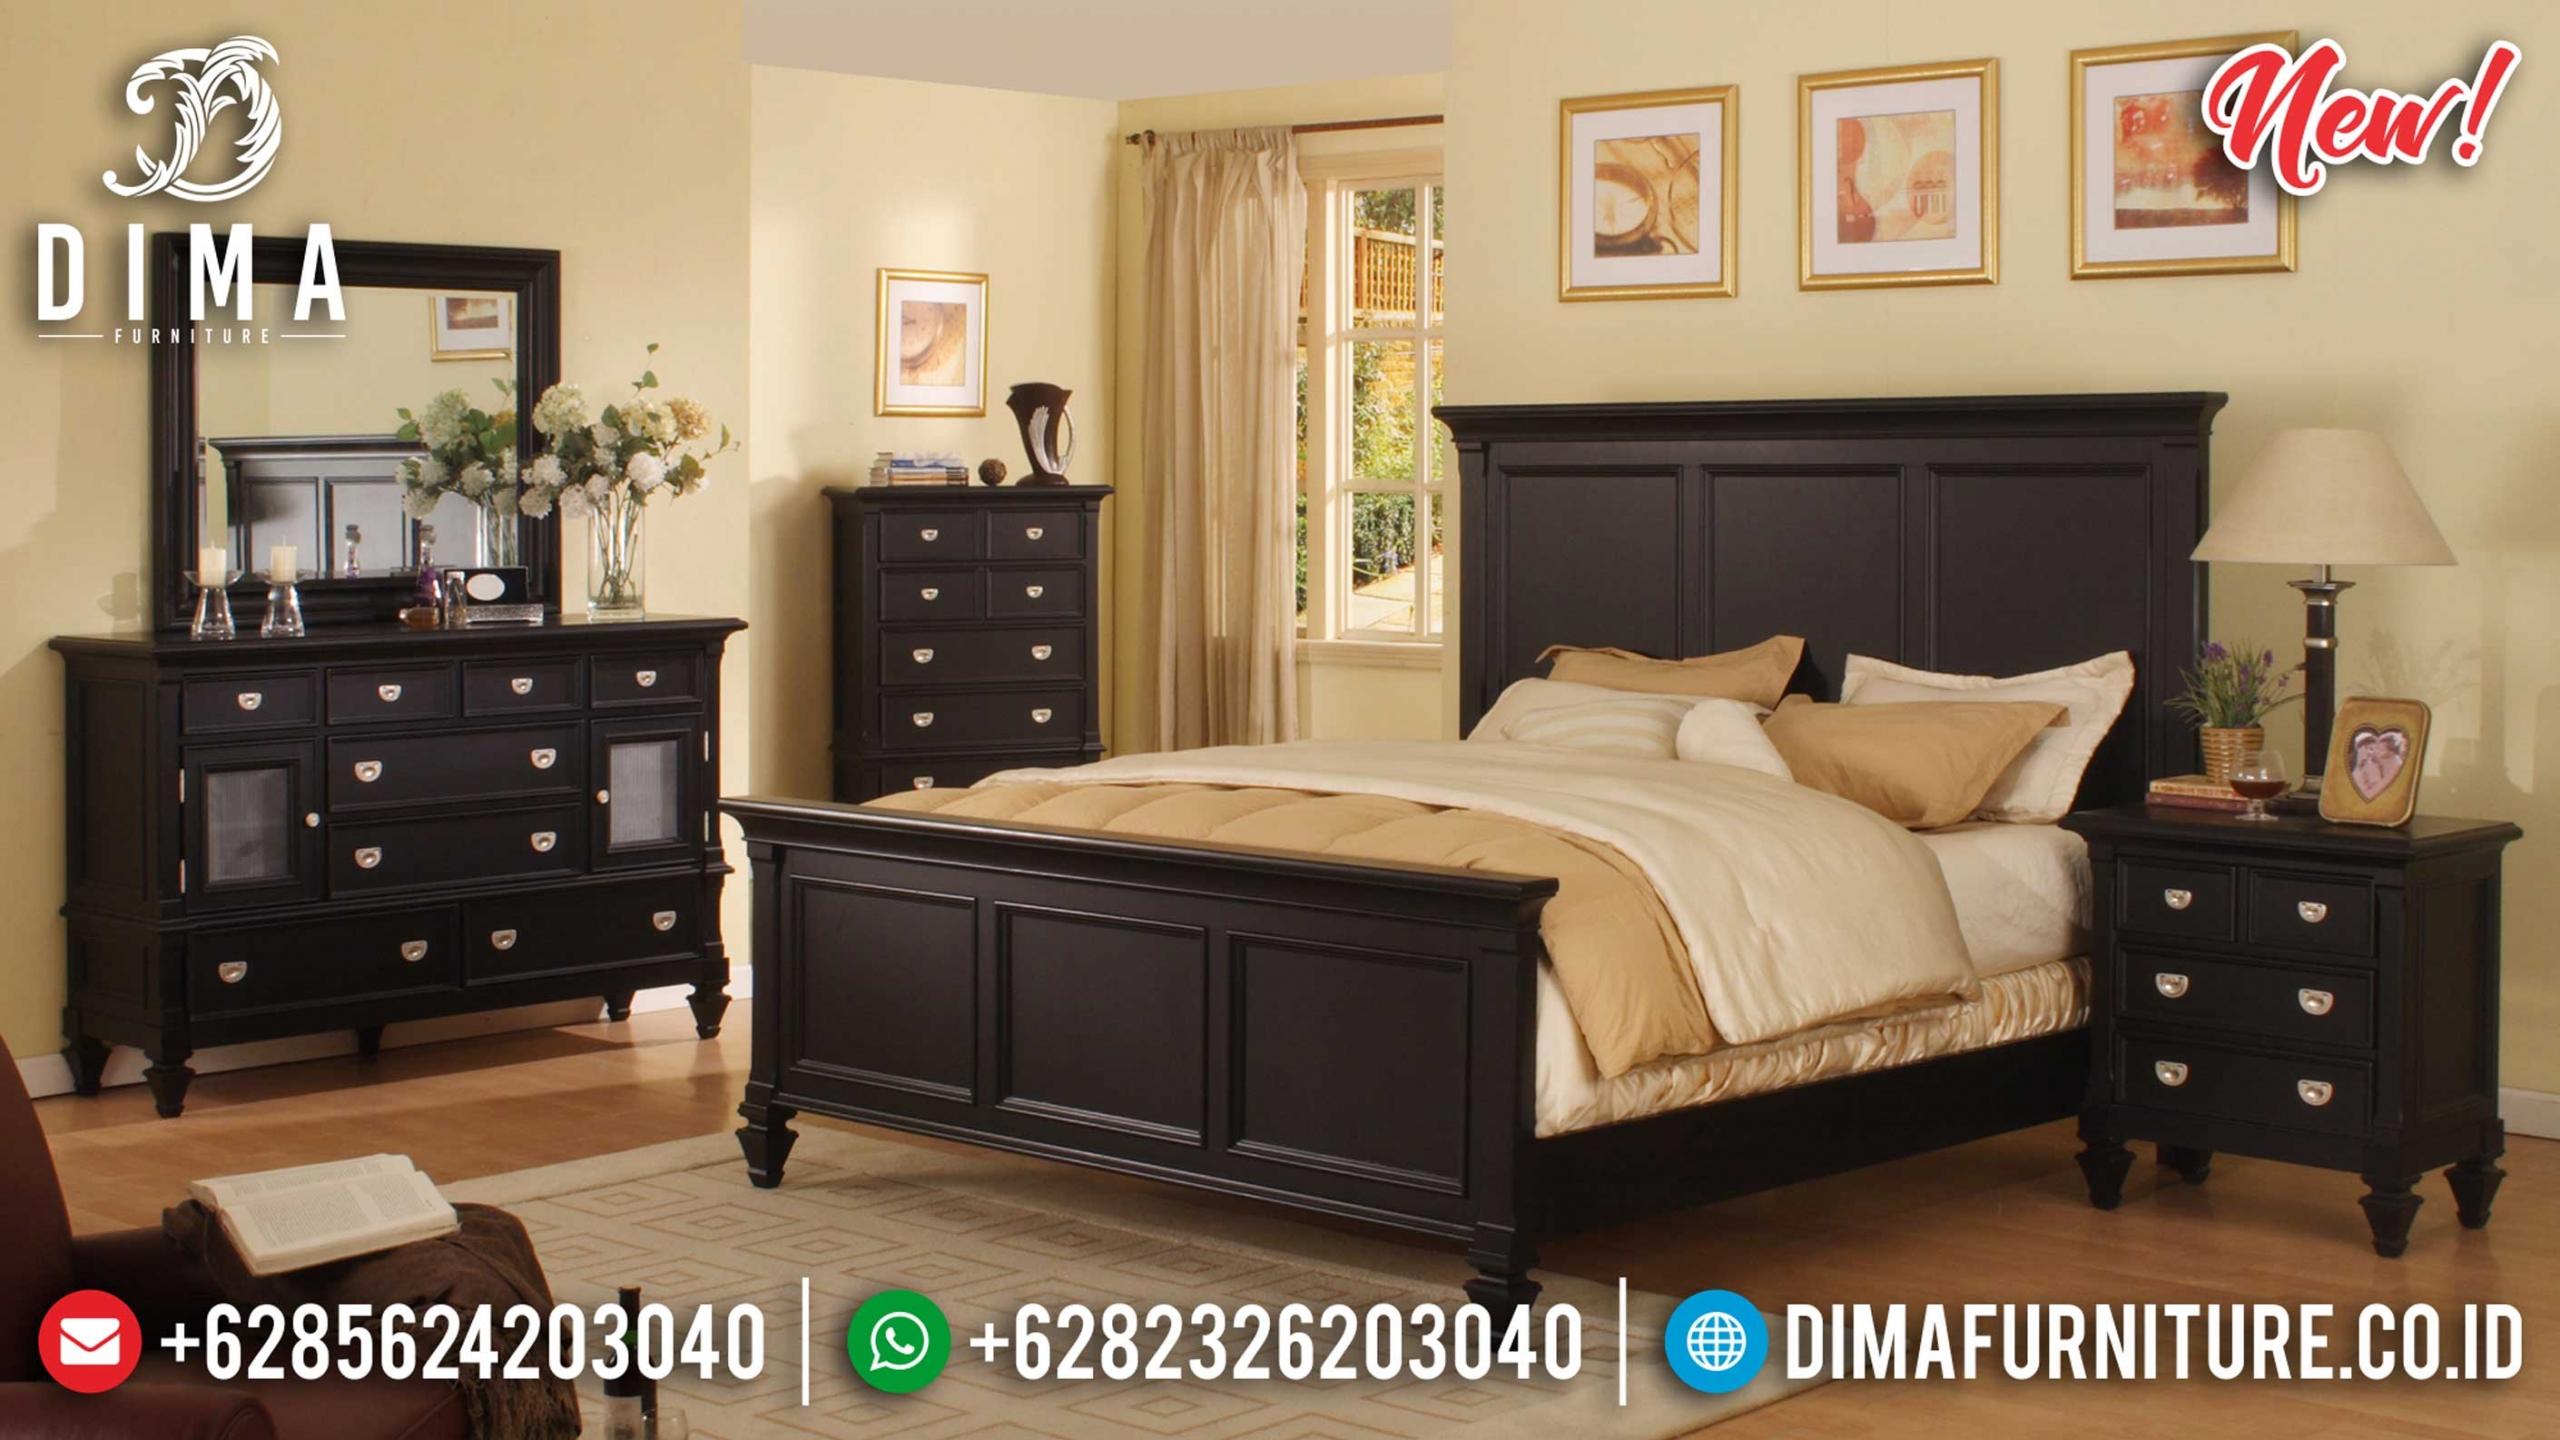 Jual Kamar Set Minimalis Black Edition New Design Inspiring BT-0920